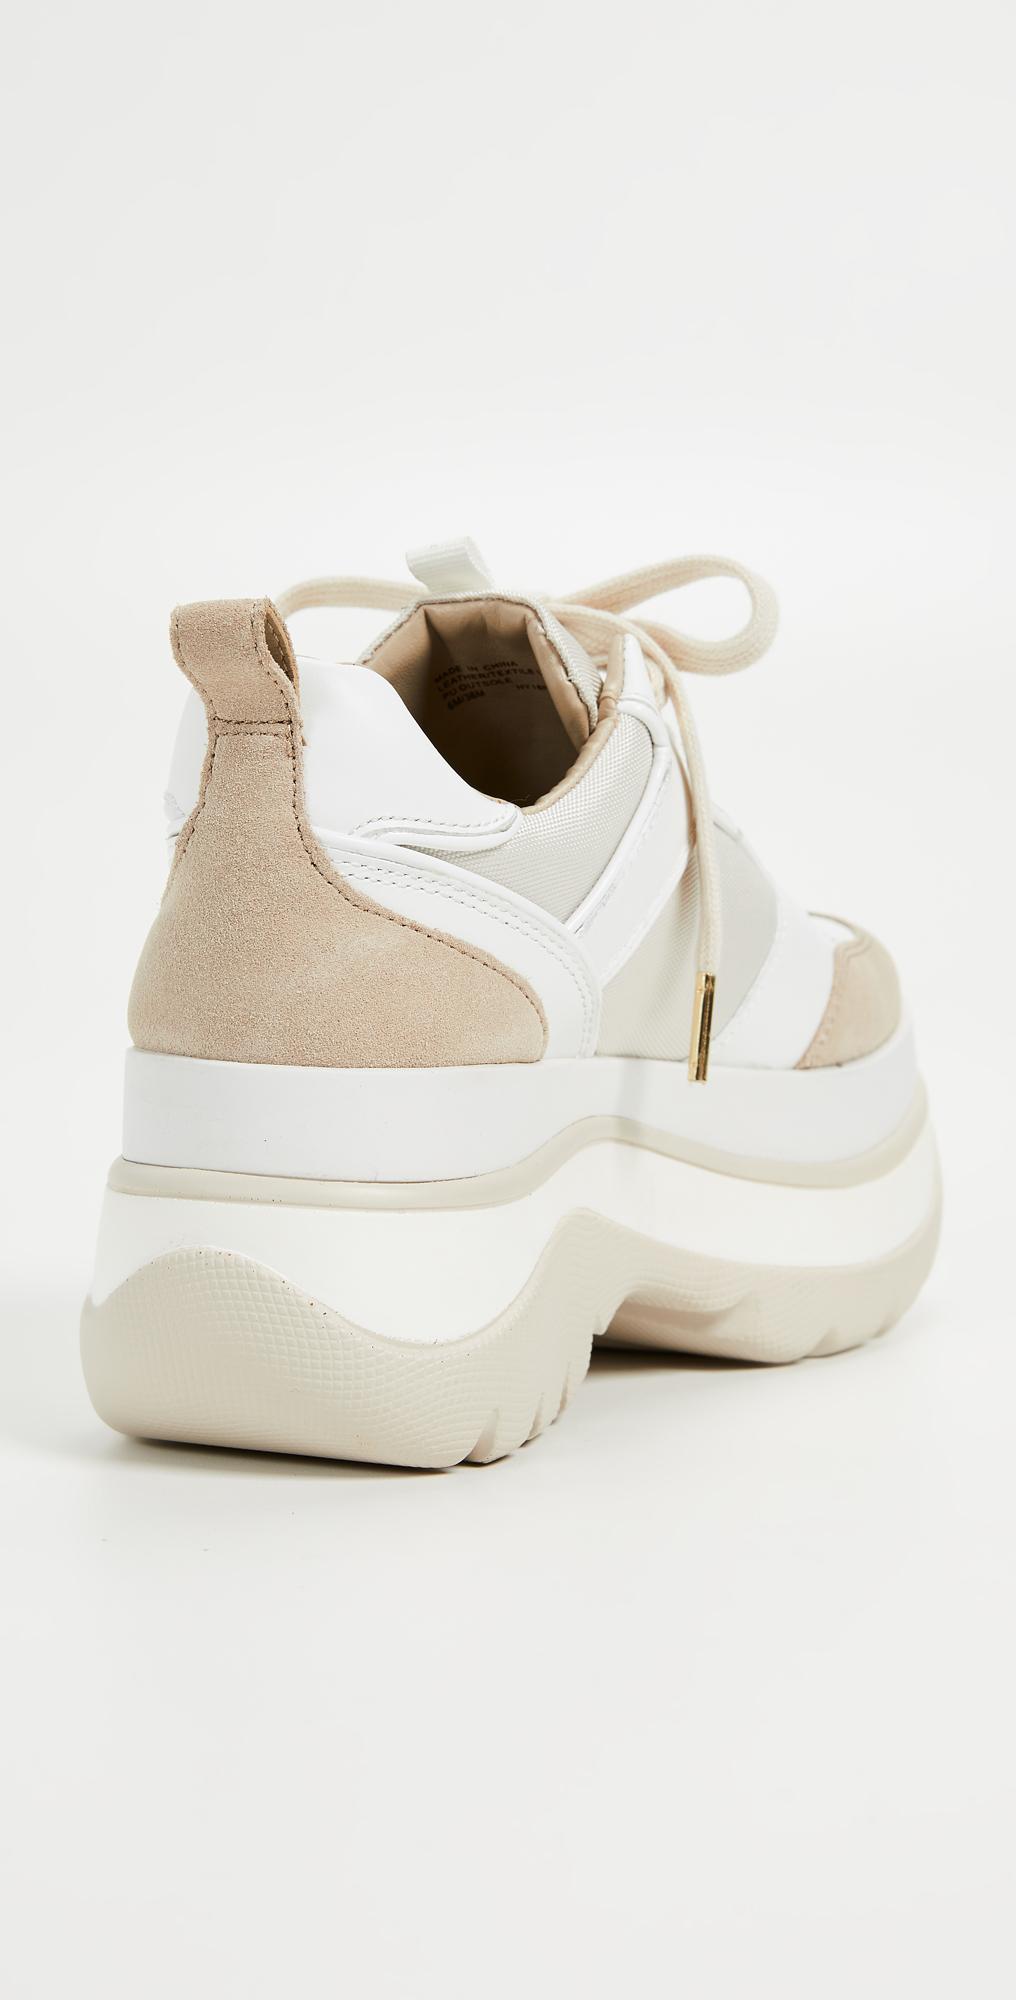 michael kors felicia sneakers